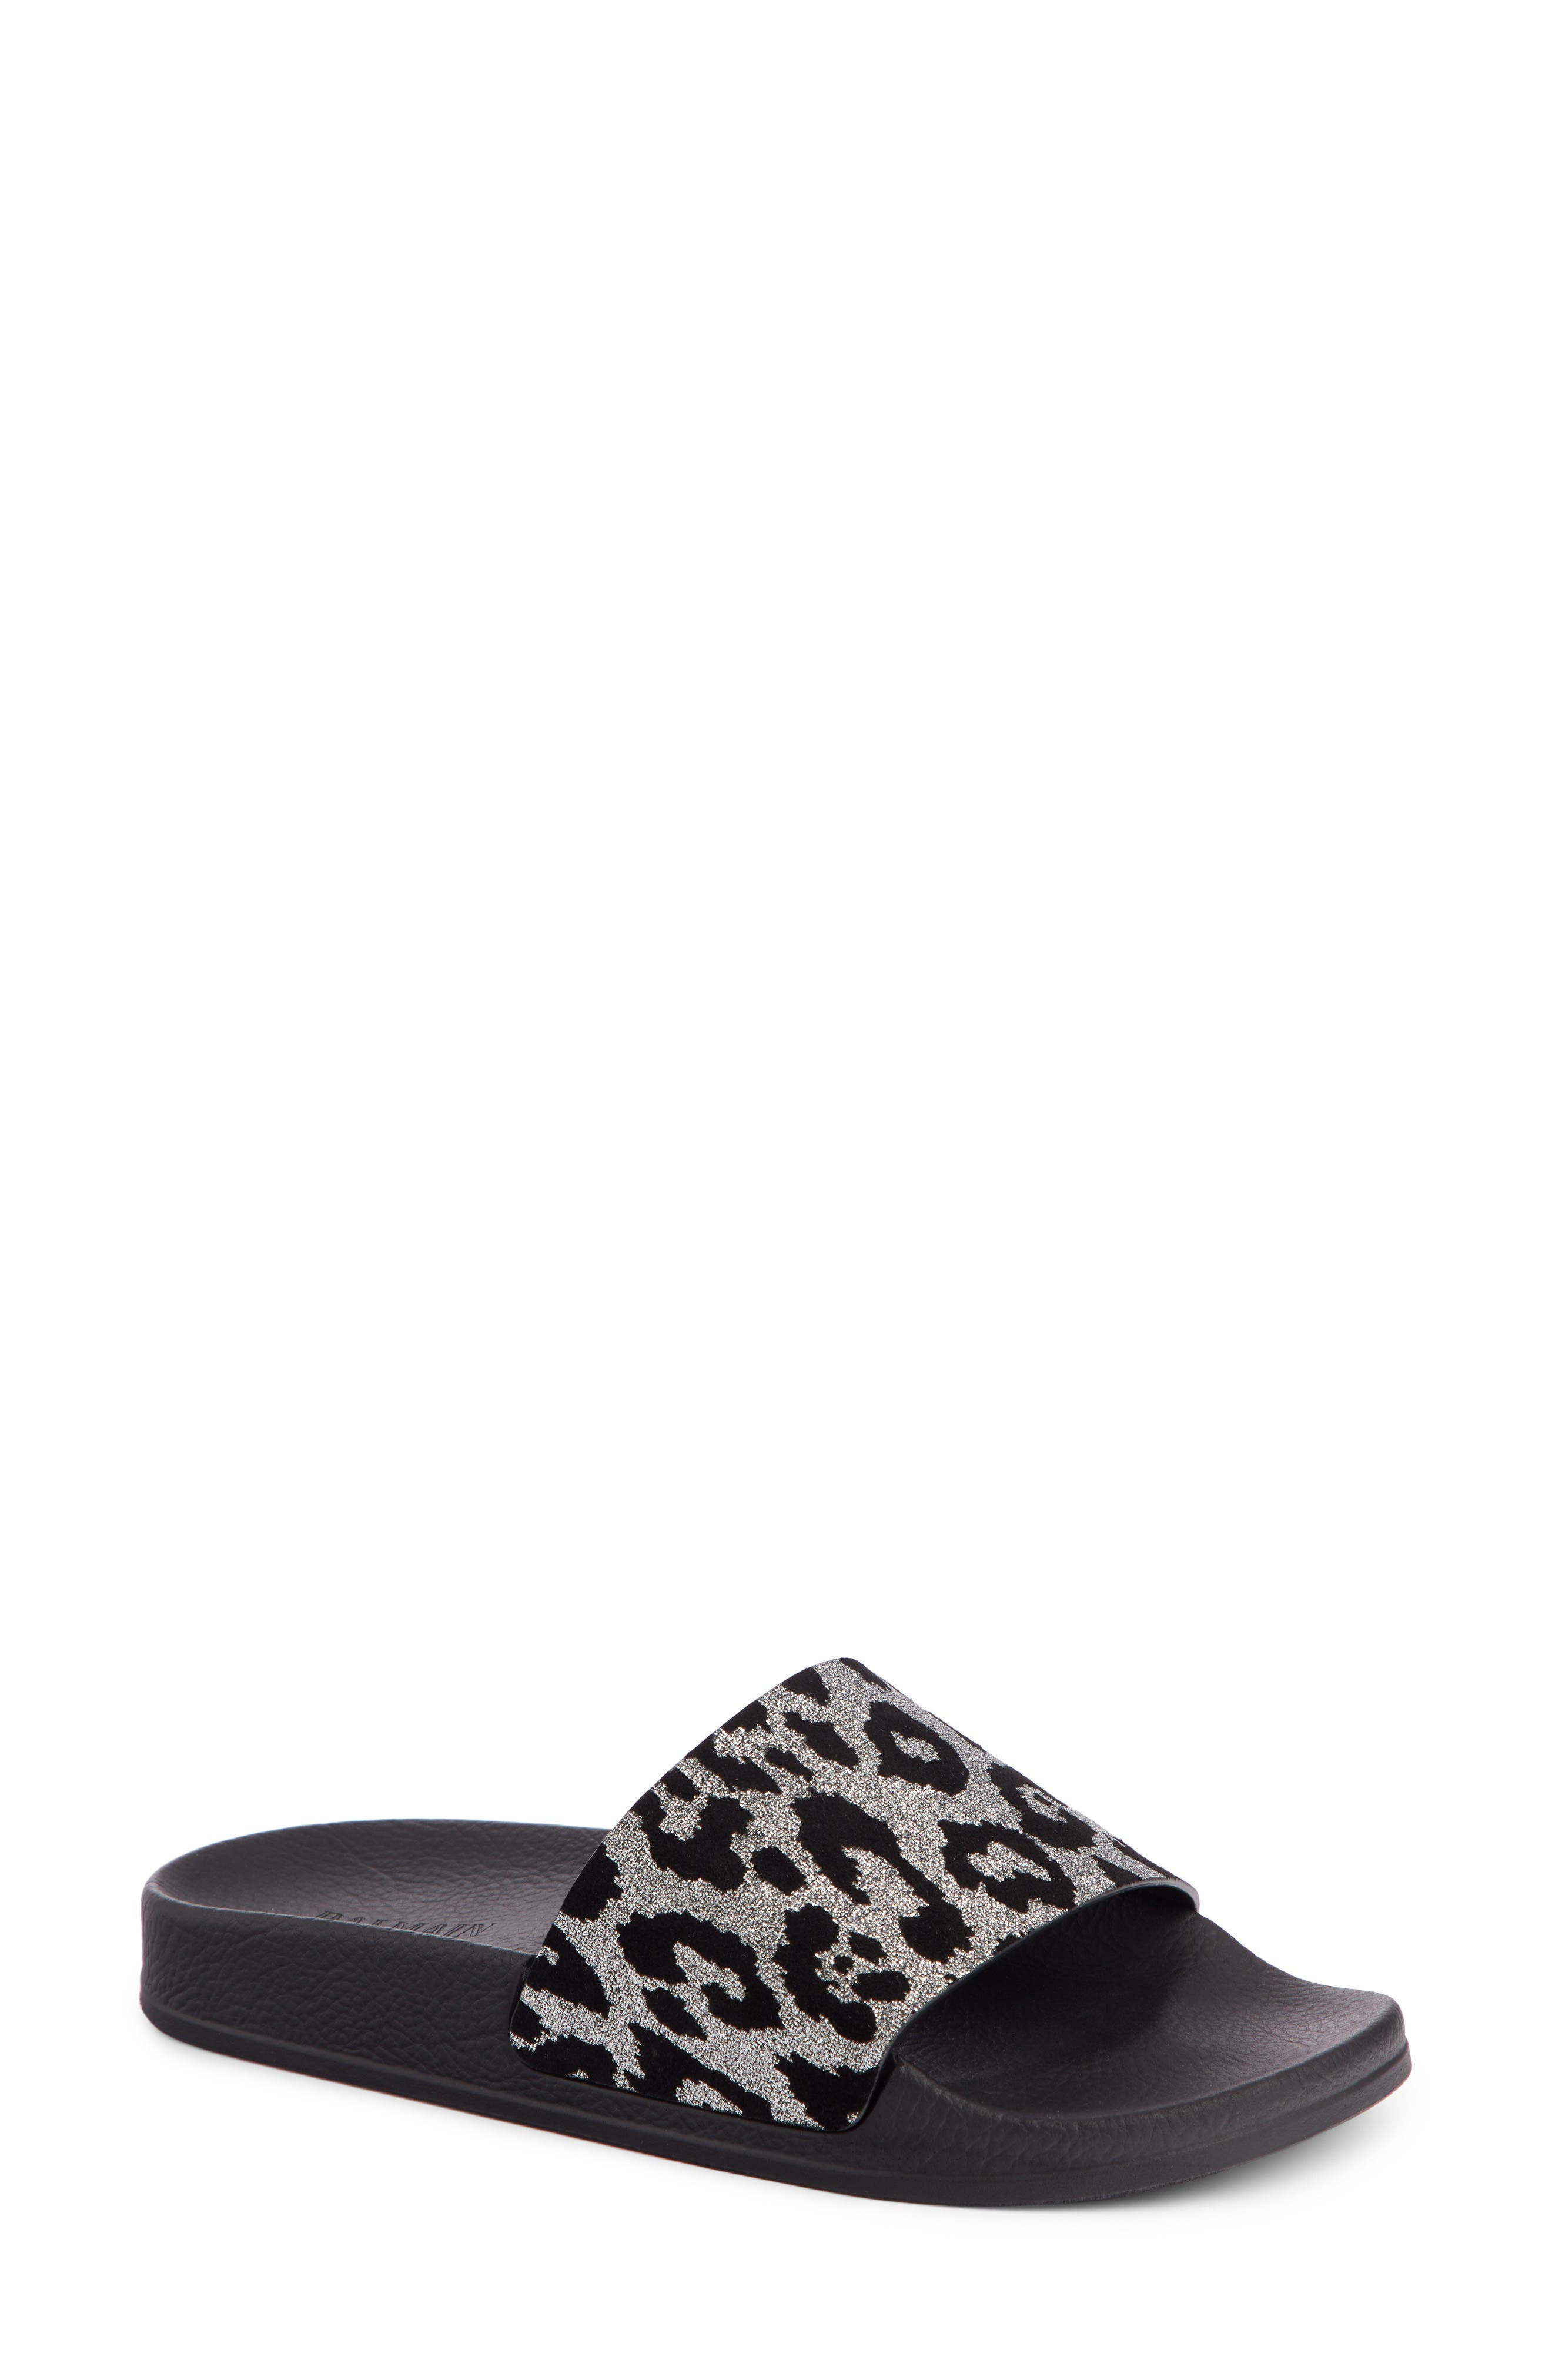 Balmain Calypso Leopard Print Slide Sandal (Women)